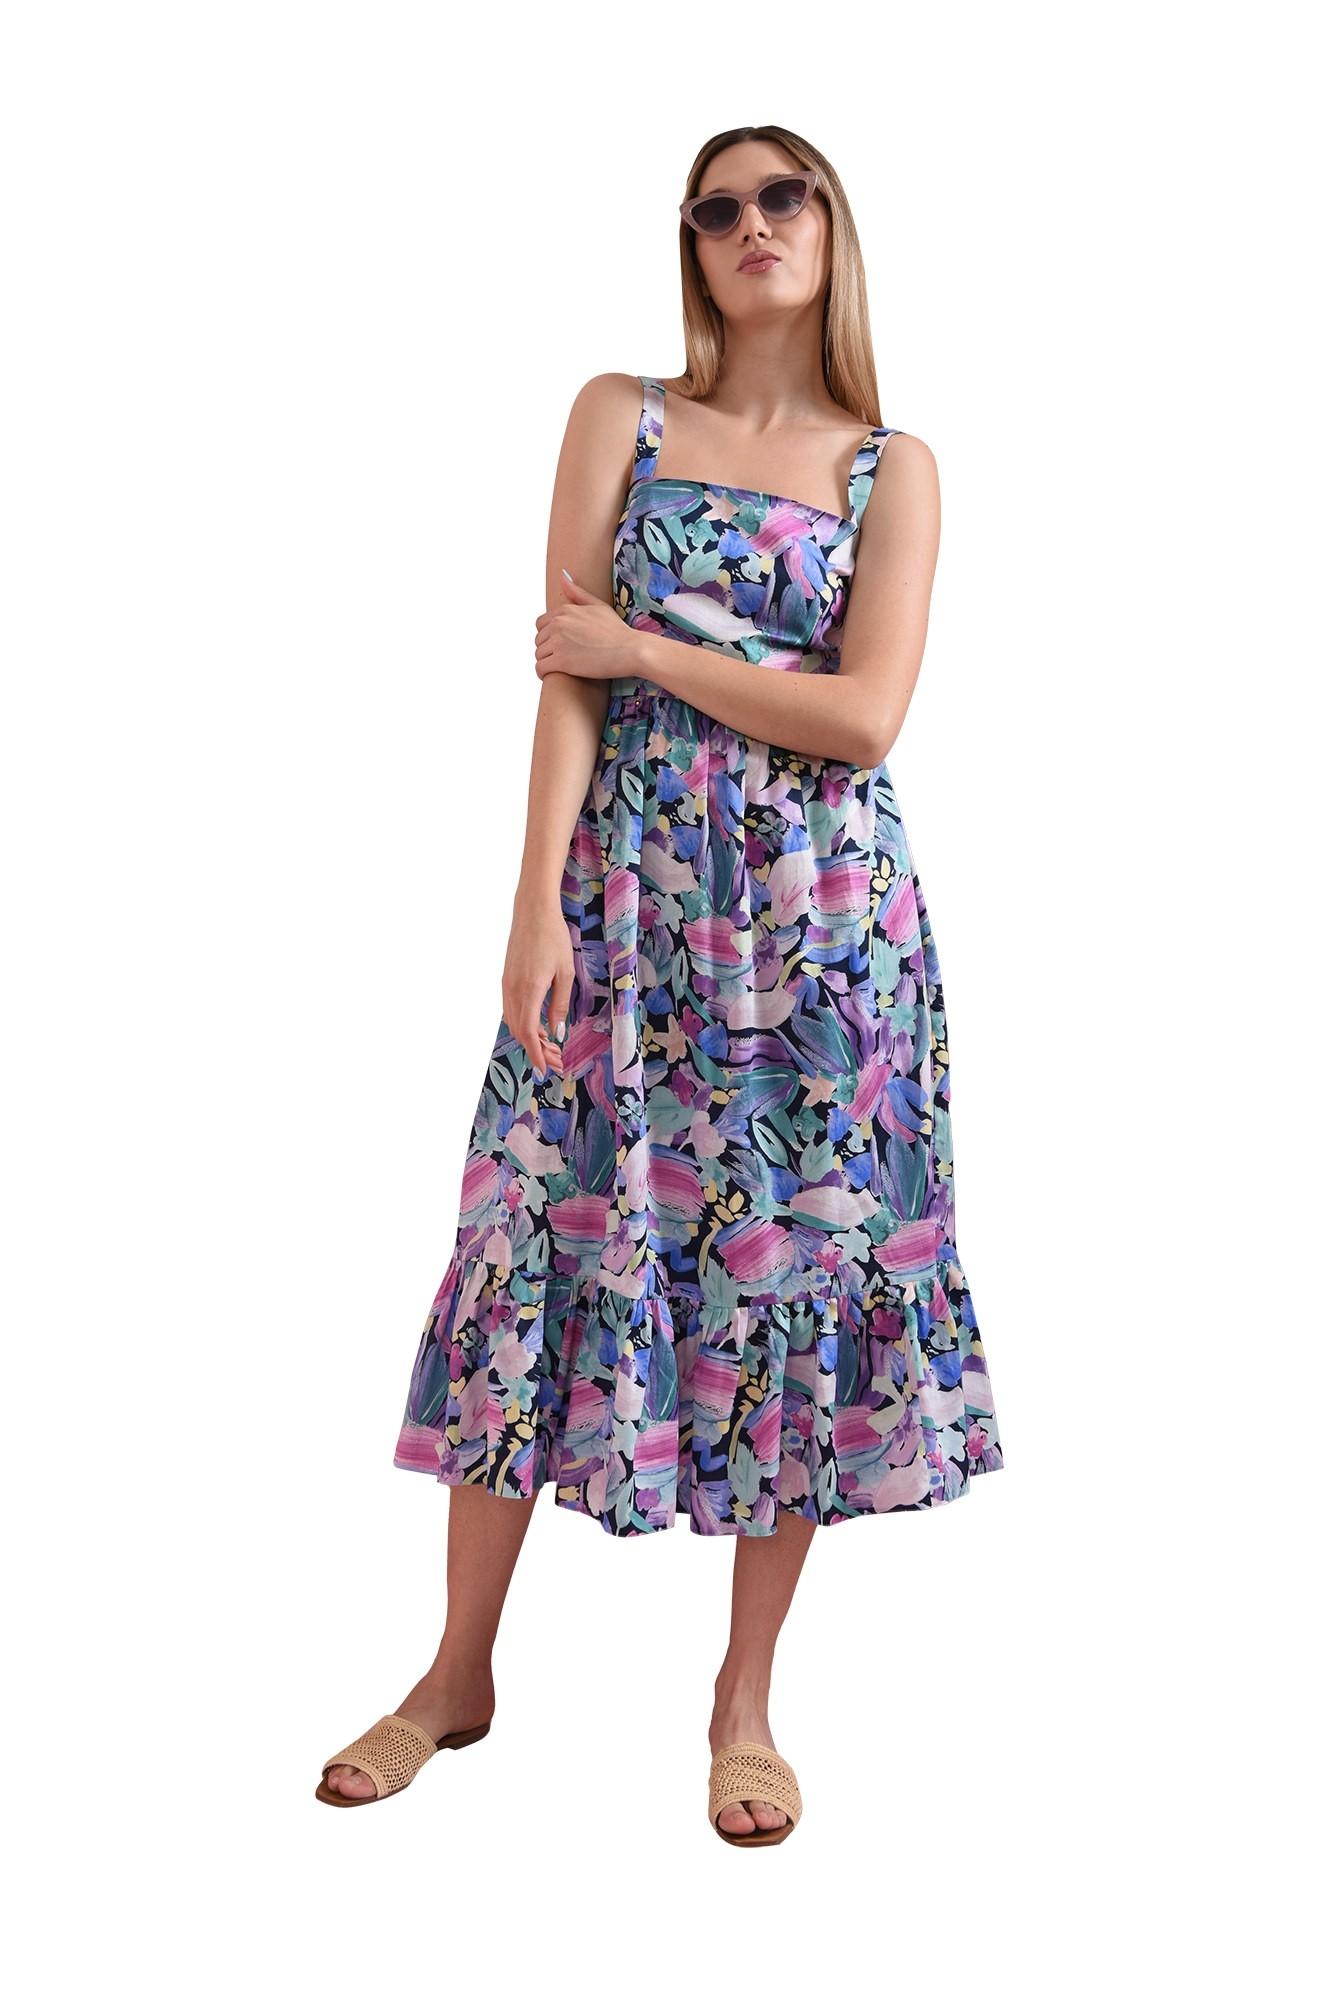 3 - rochie cu imprimeu multicolor, cu bretele